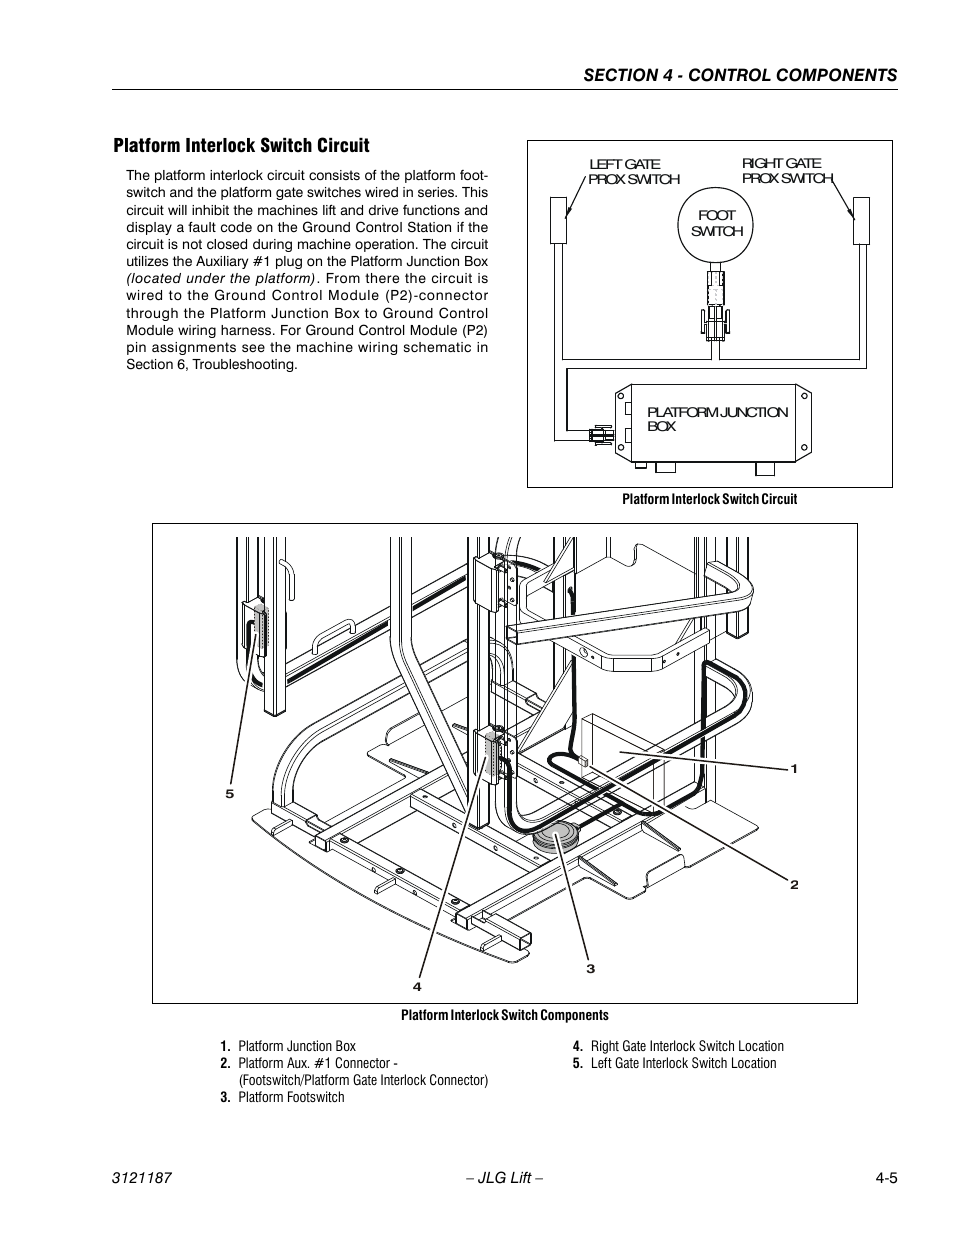 platform interlock switch circuit, platform interlock switch circuit 7 Pin Trailer Wiring Diagram platform interlock switch circuit, platform interlock switch circuit 5 jlg ssv10 service manual user manual page 59 136